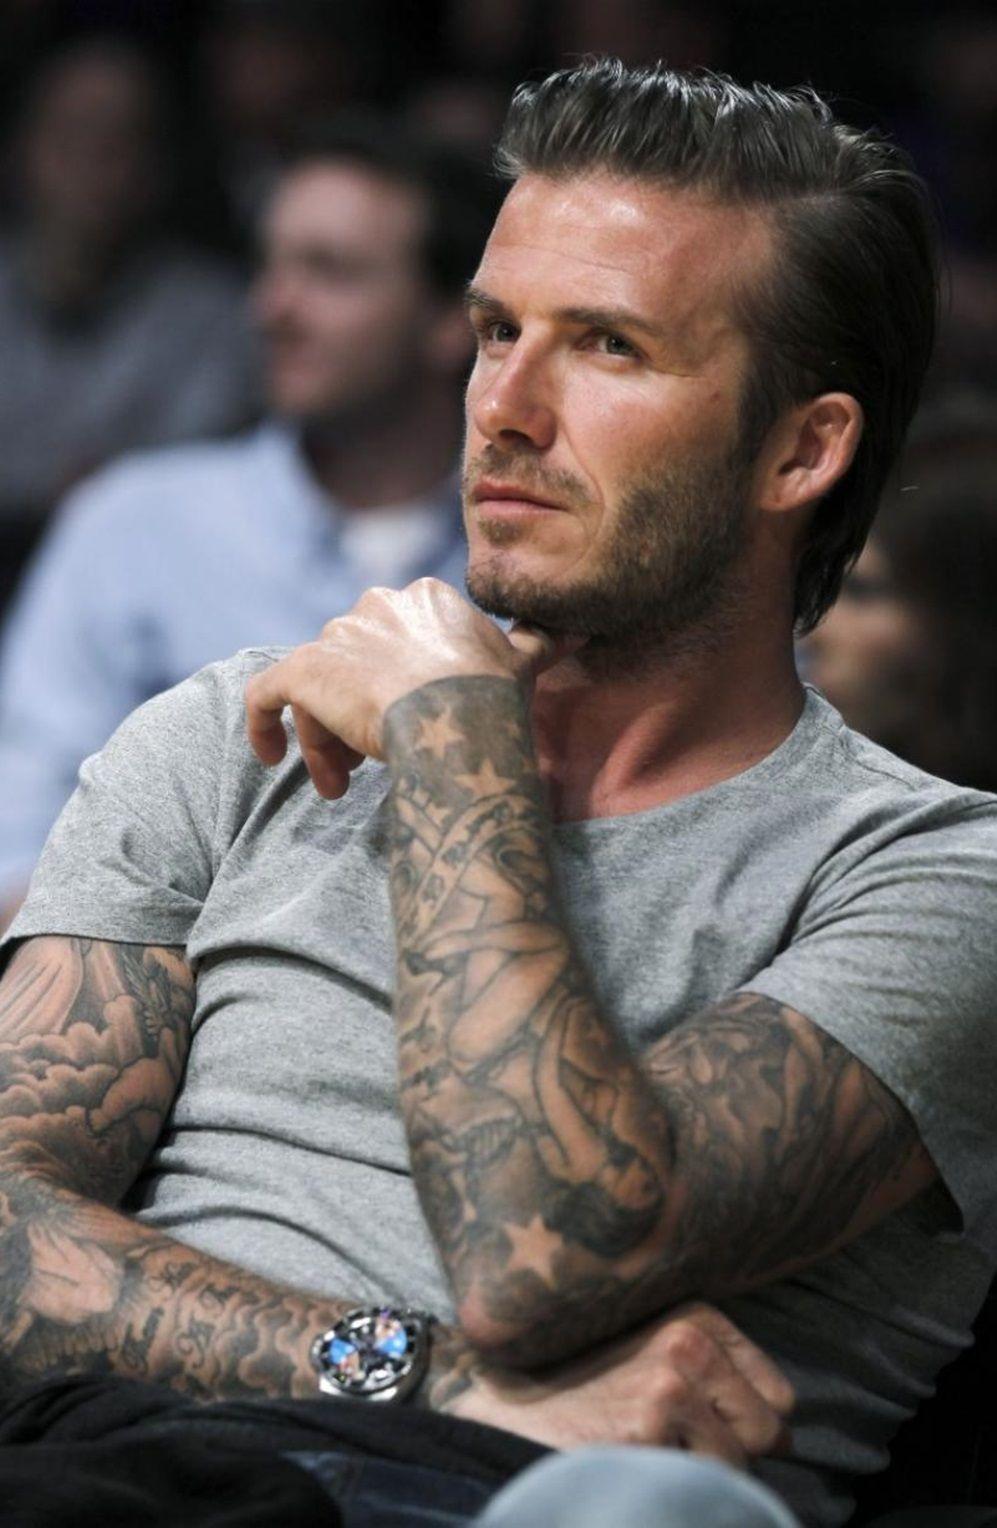 David Beckham I Lovvee His Tattoo Sleeves D David Beckham Tattoos David Beckham Sleeve Celebrity Tattoos